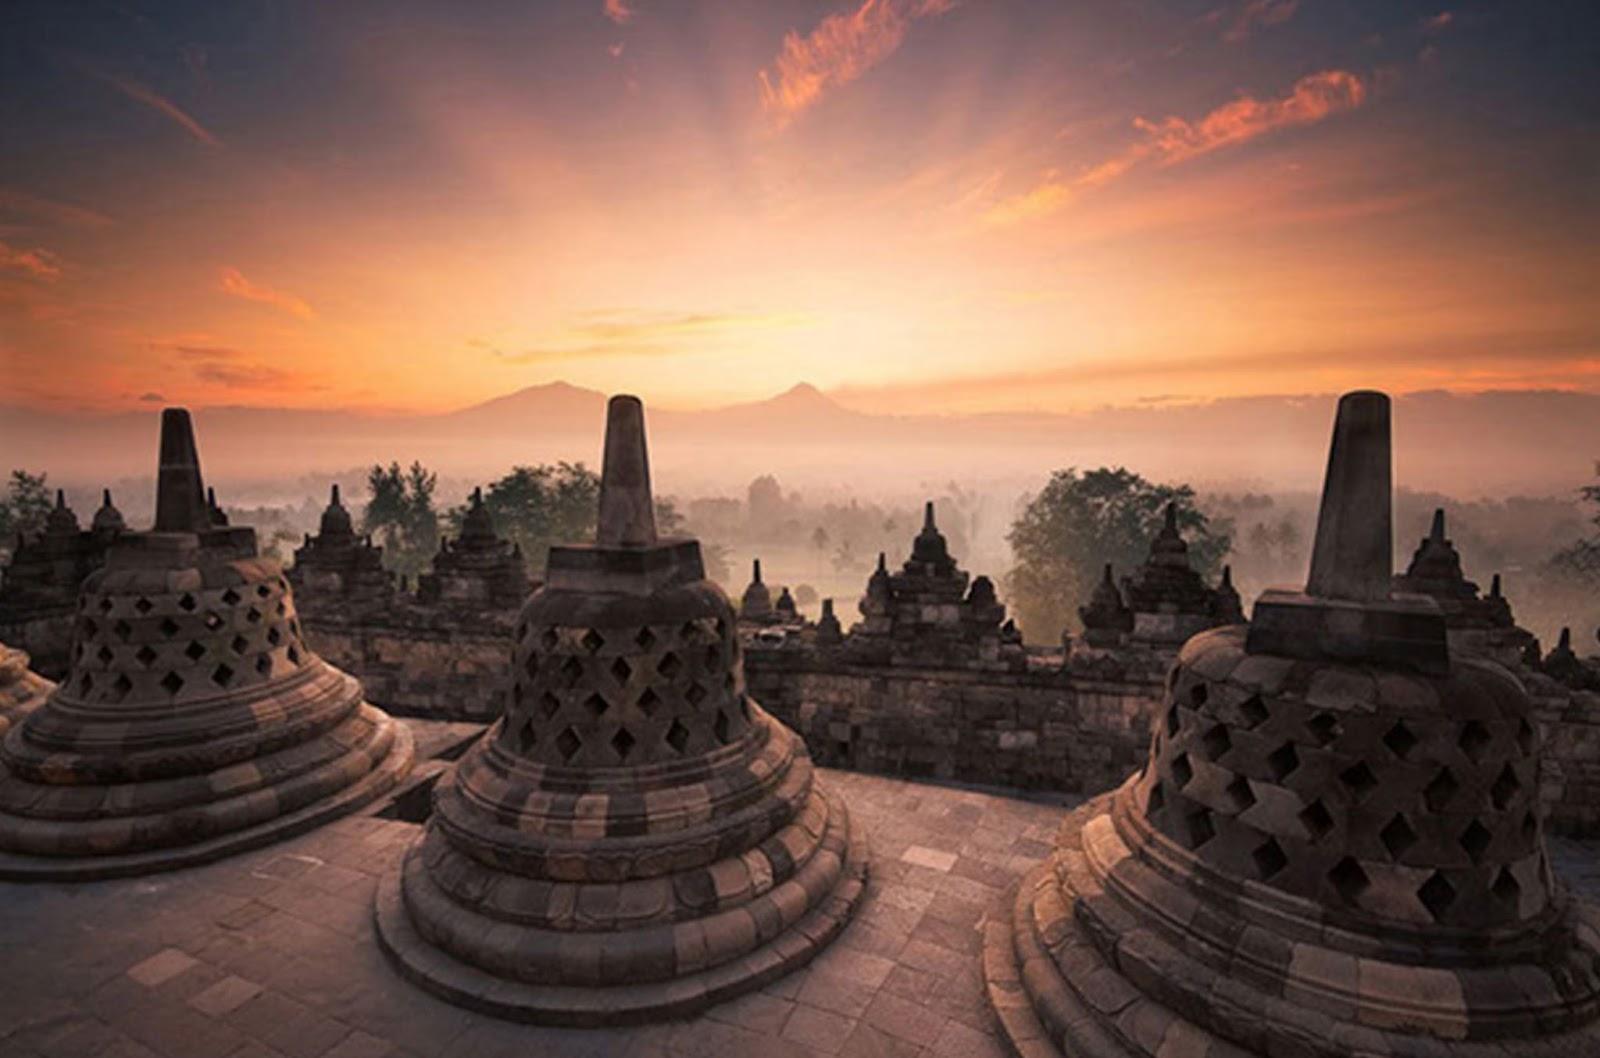 Arkadio Tourism Dbali Nusa Dua Super Deal Package Flying Fish Jetsky Banana Boat Borobudur Temple